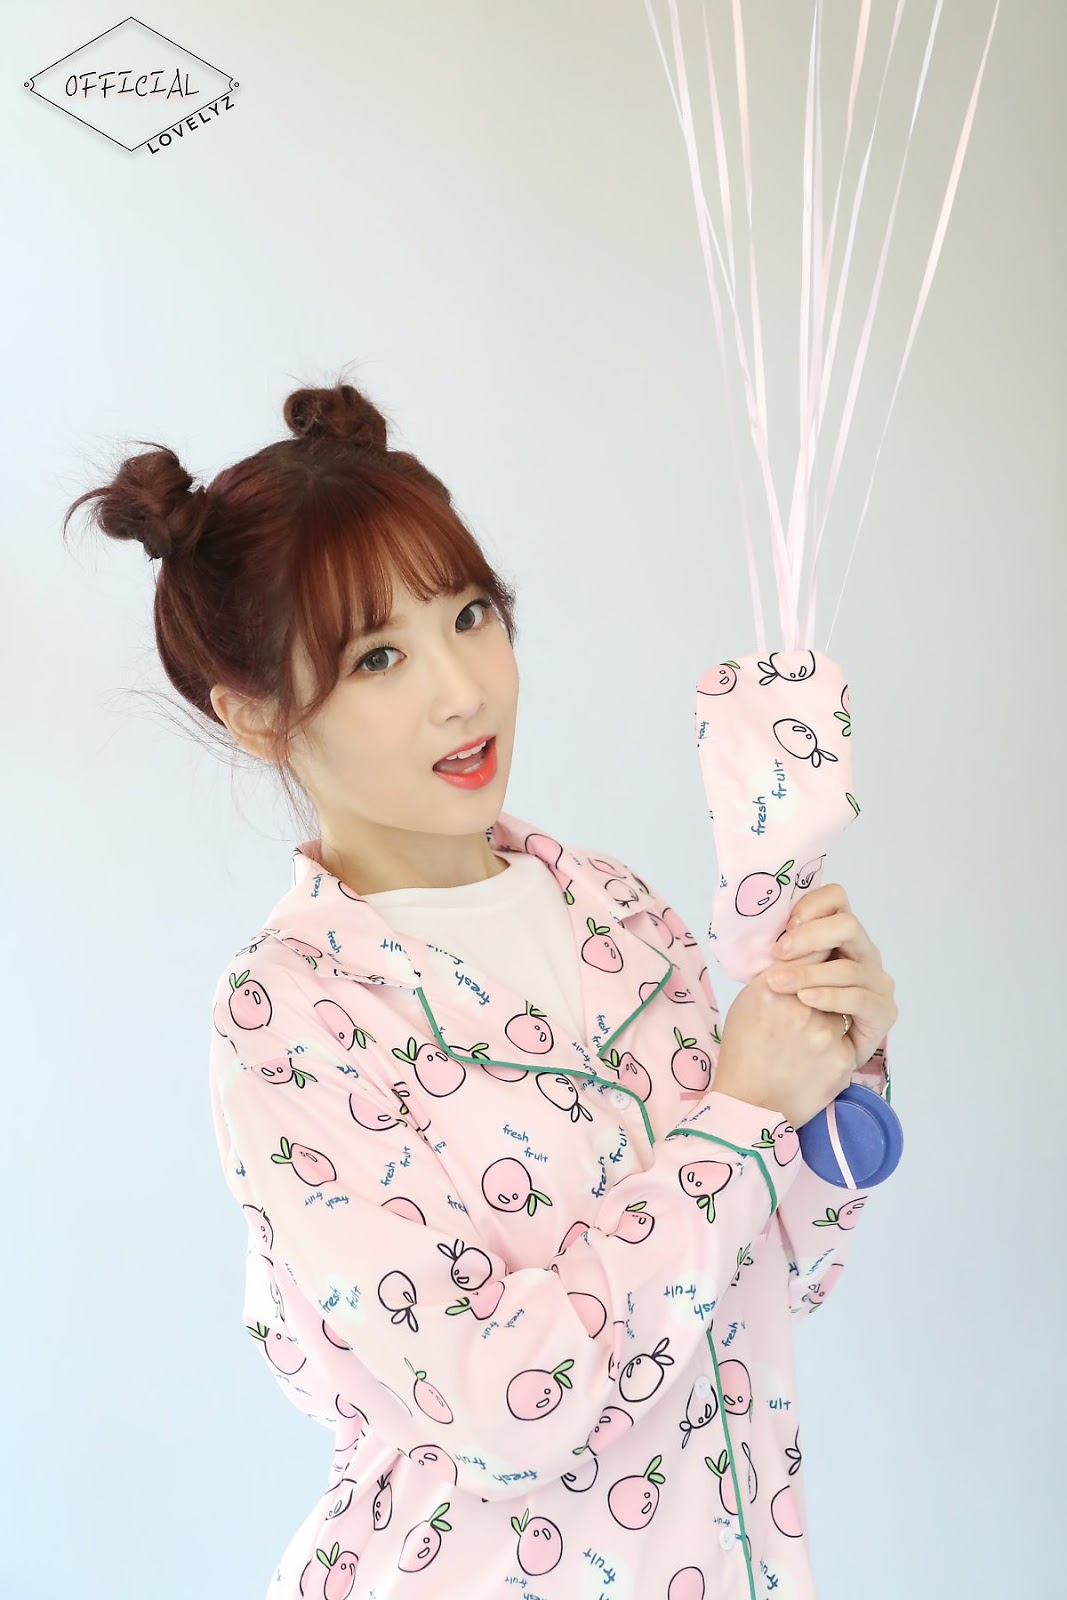 idolssleephabits_jiae